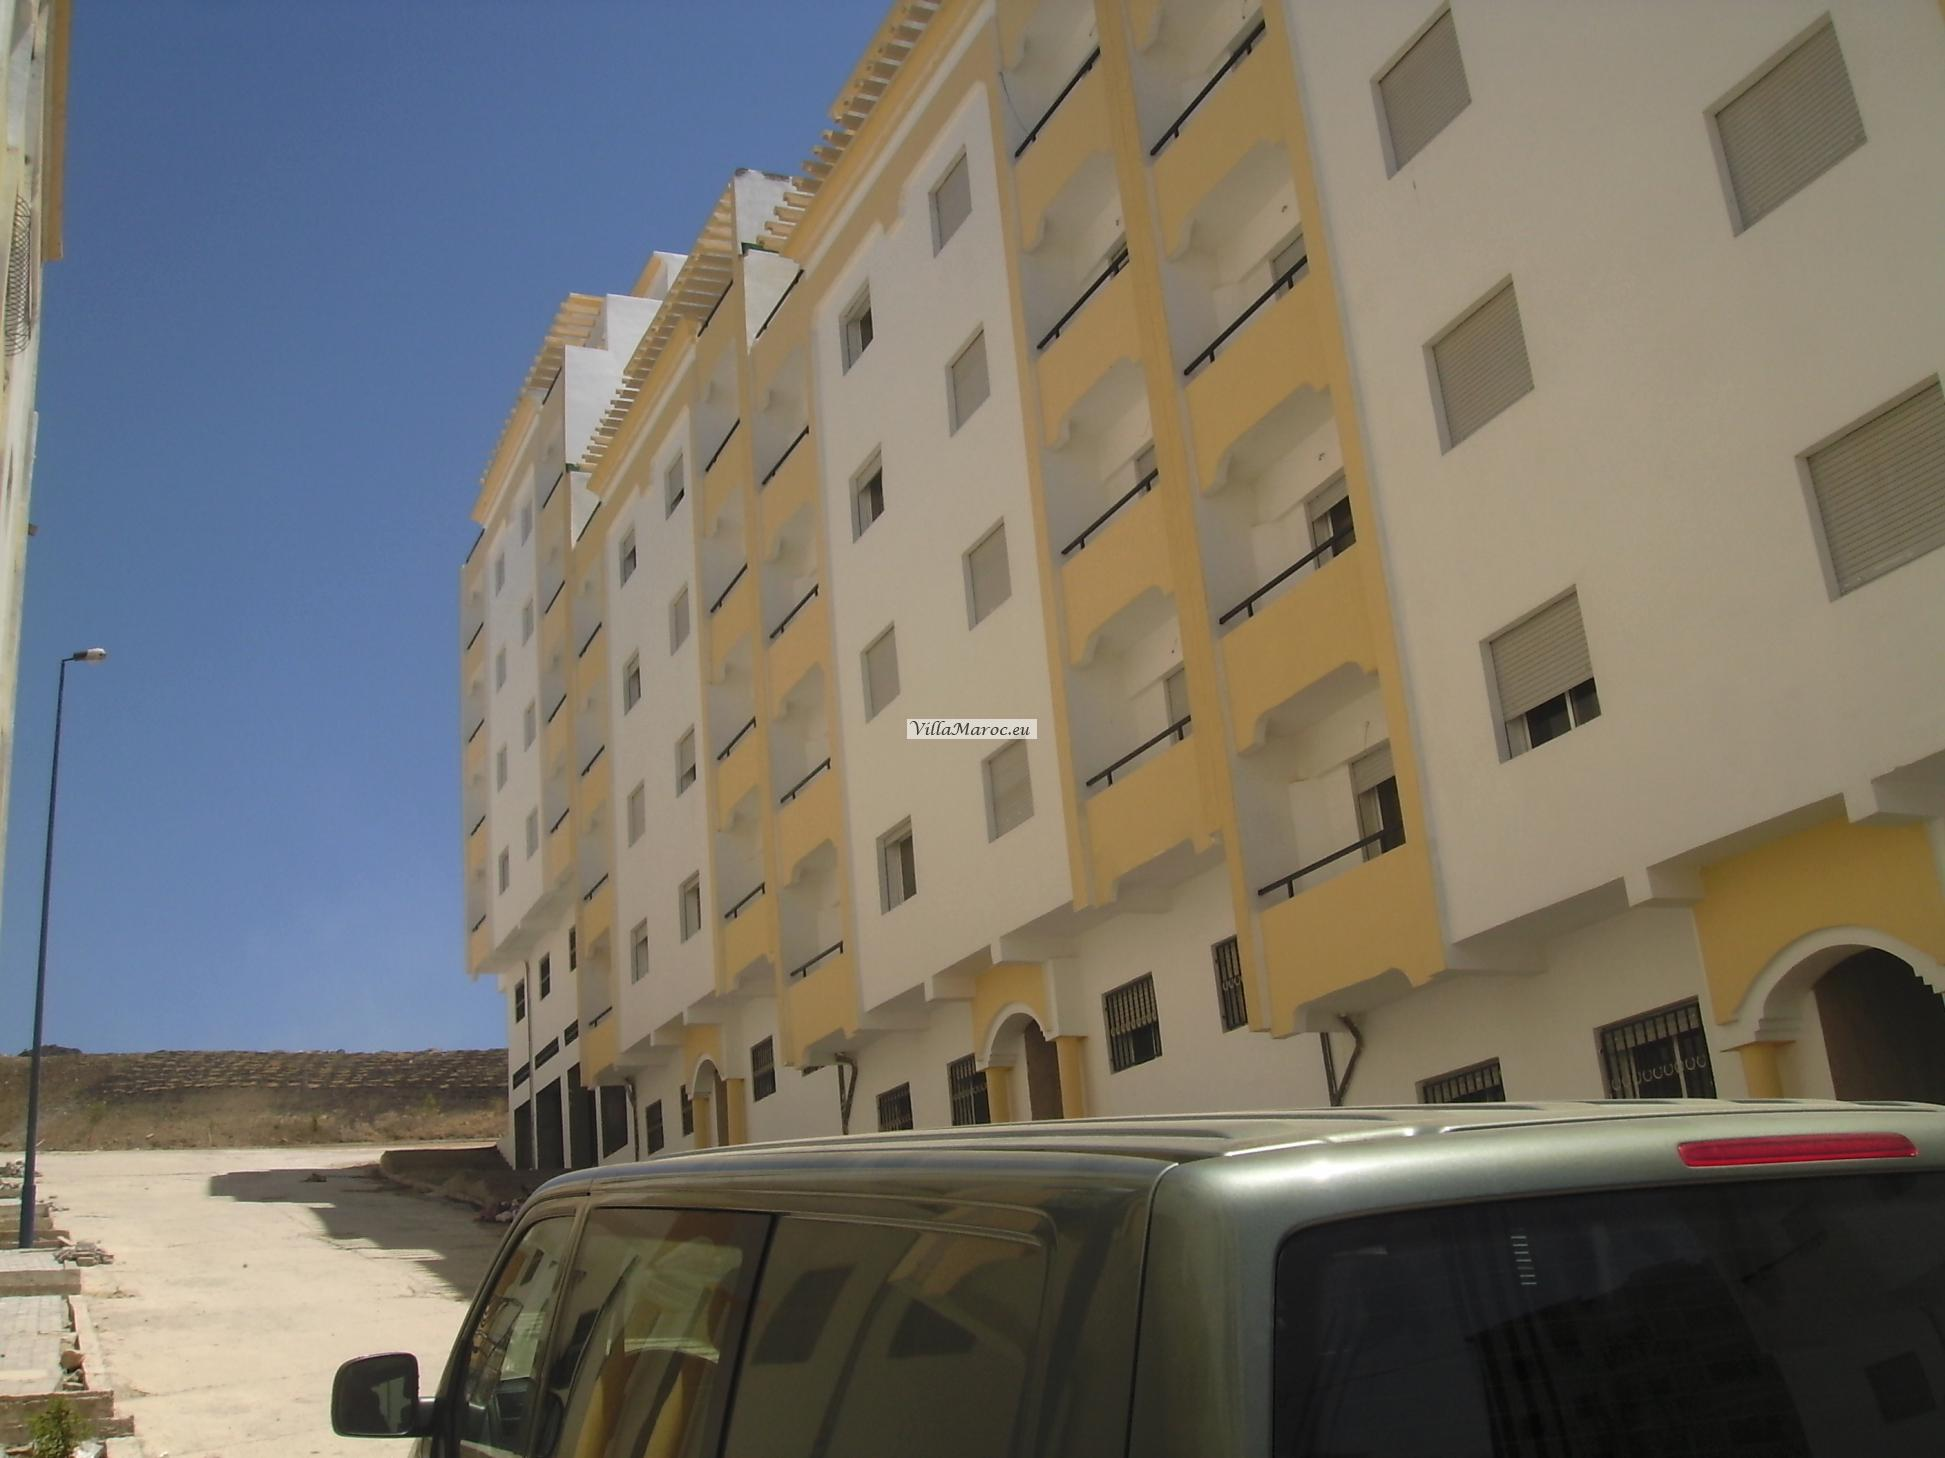 Huis in marokko for Huis appartement te koop